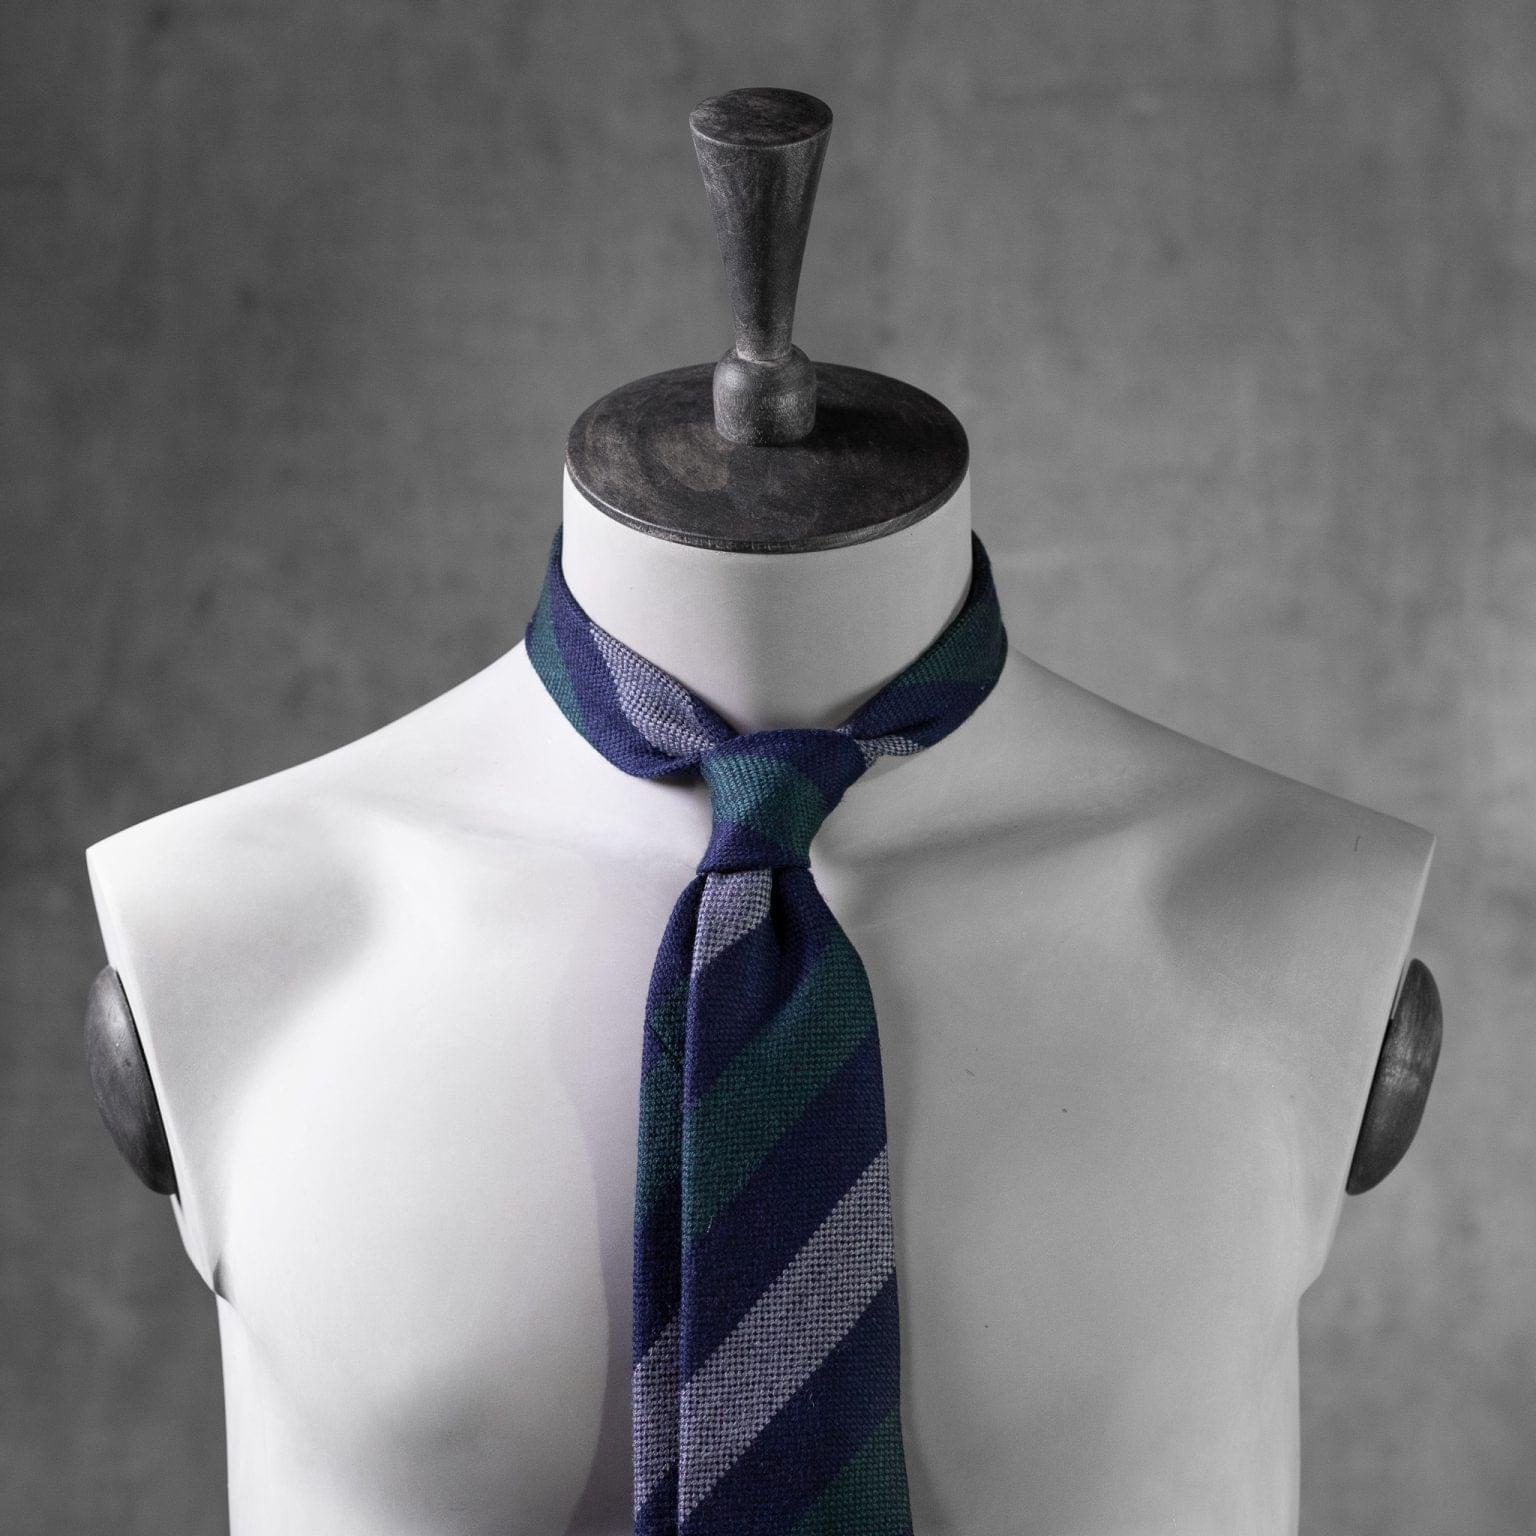 WOOL-LANA-0517-Tie-Initials-Corbata-Iniciales-The-Seelk-3